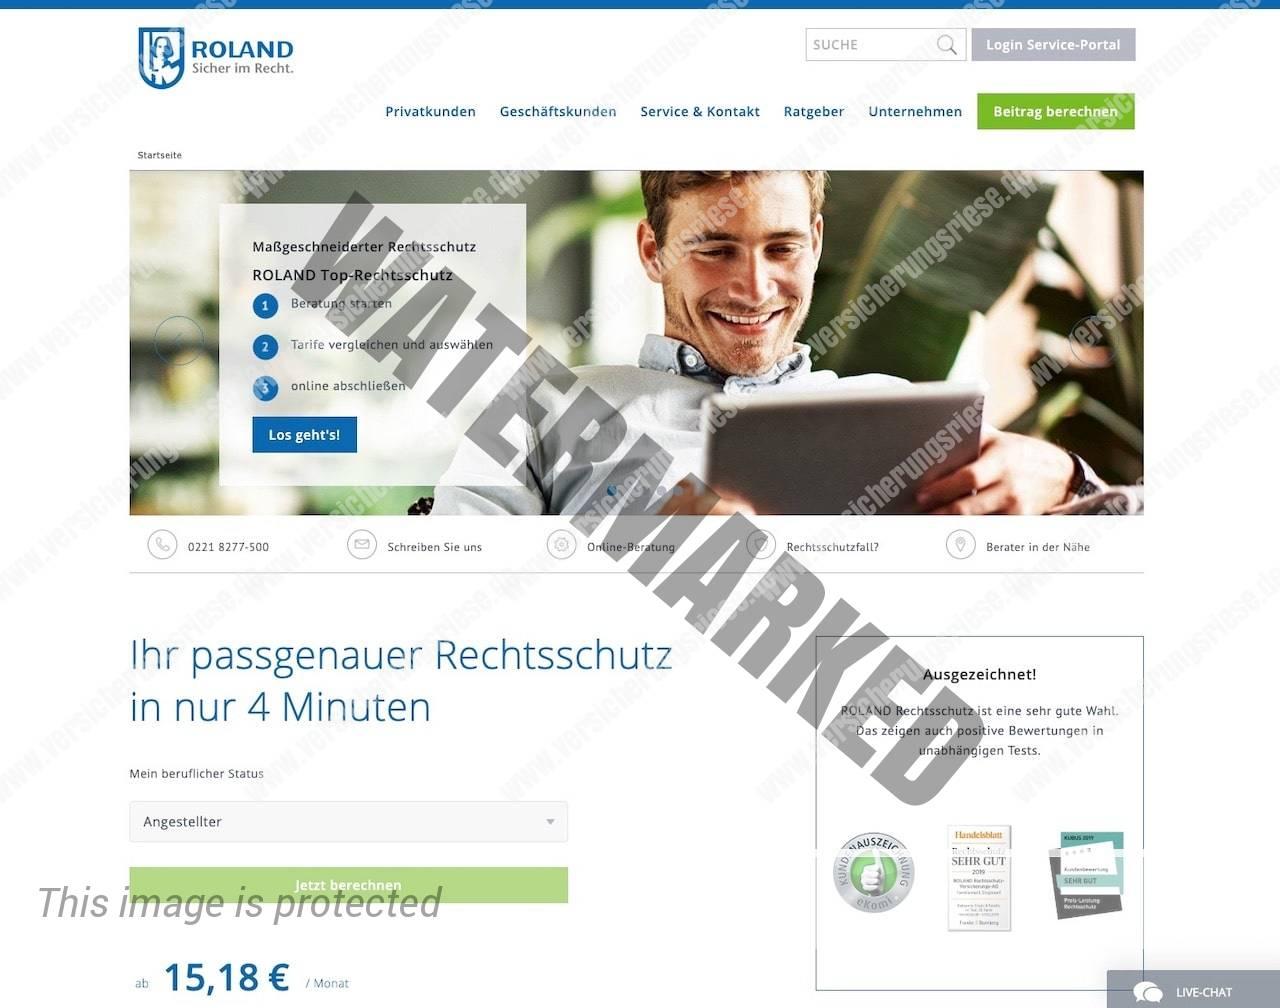 Roland Rechtsschutzversicherung Webseite Screenshot